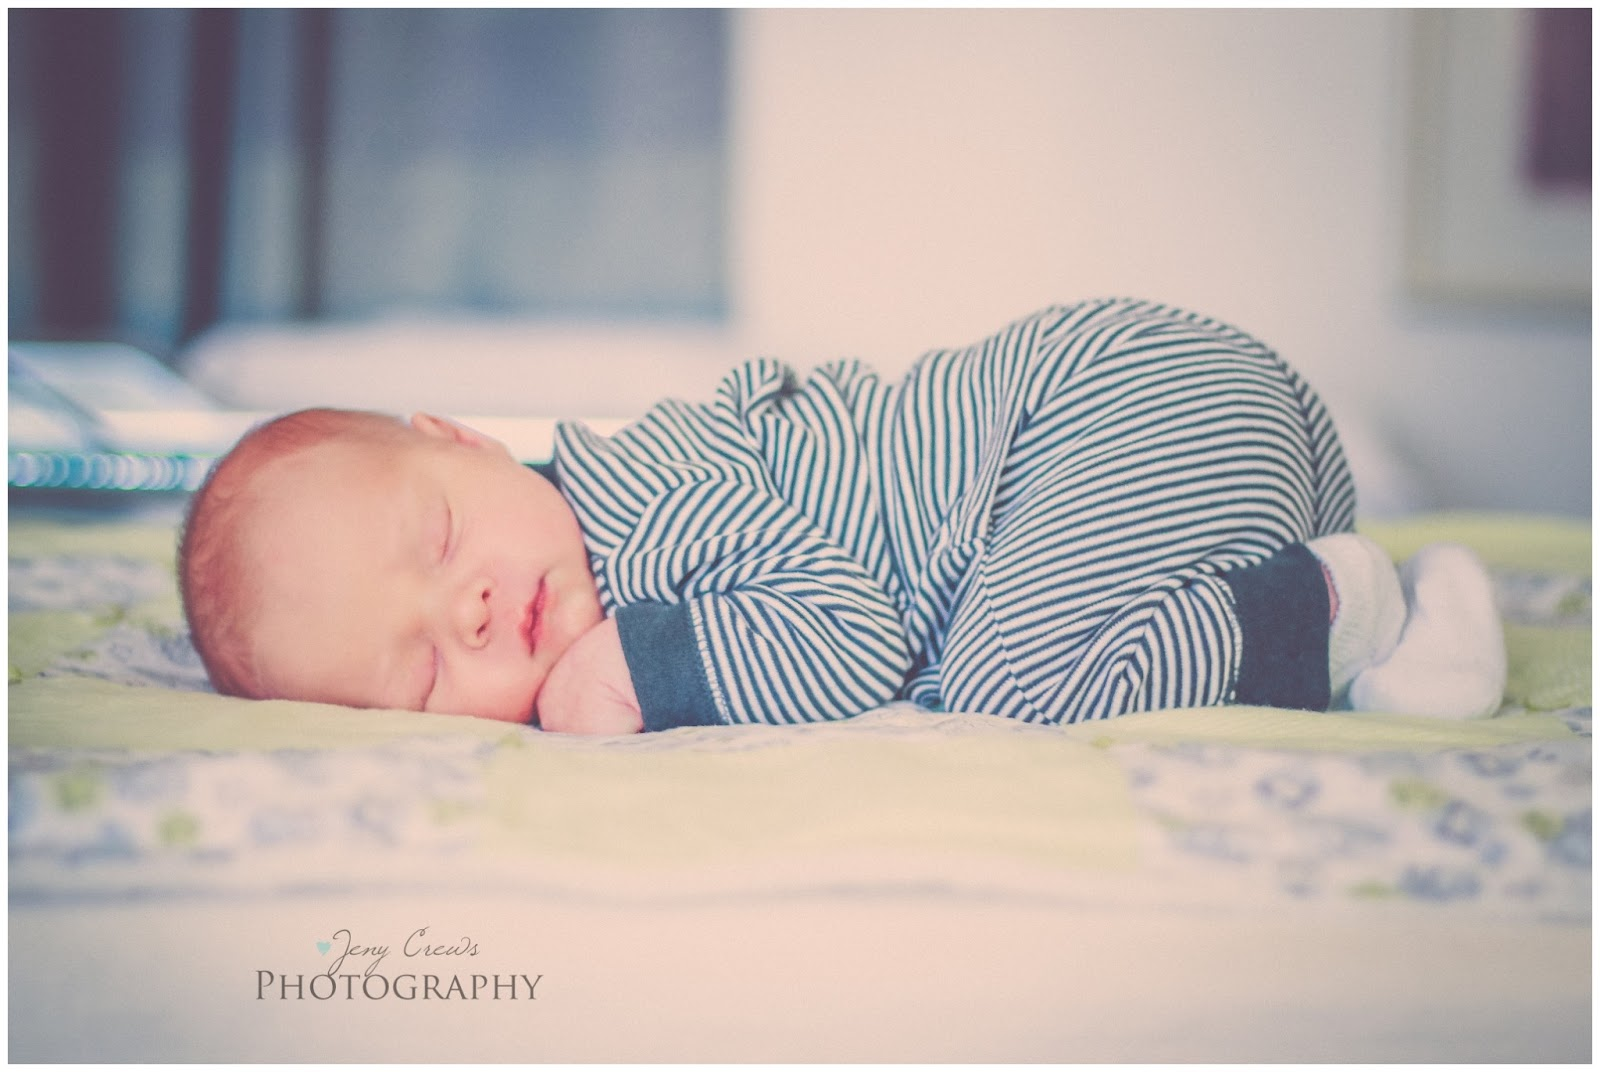 jeny crews photography  baby dean u0026 39 s birth story sneak peek